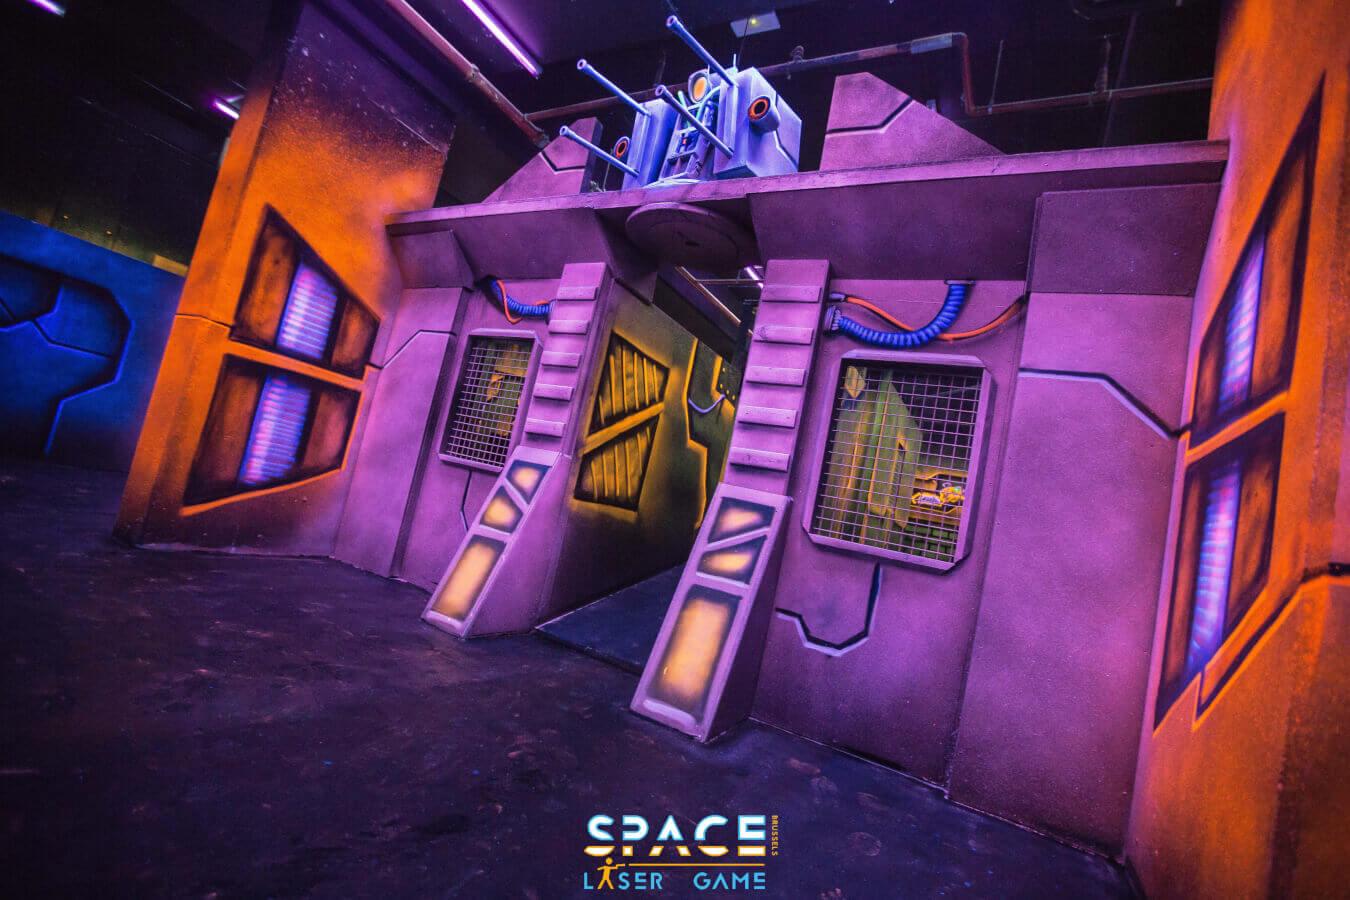 Galerie photo Space Laser Game LaserMaxx